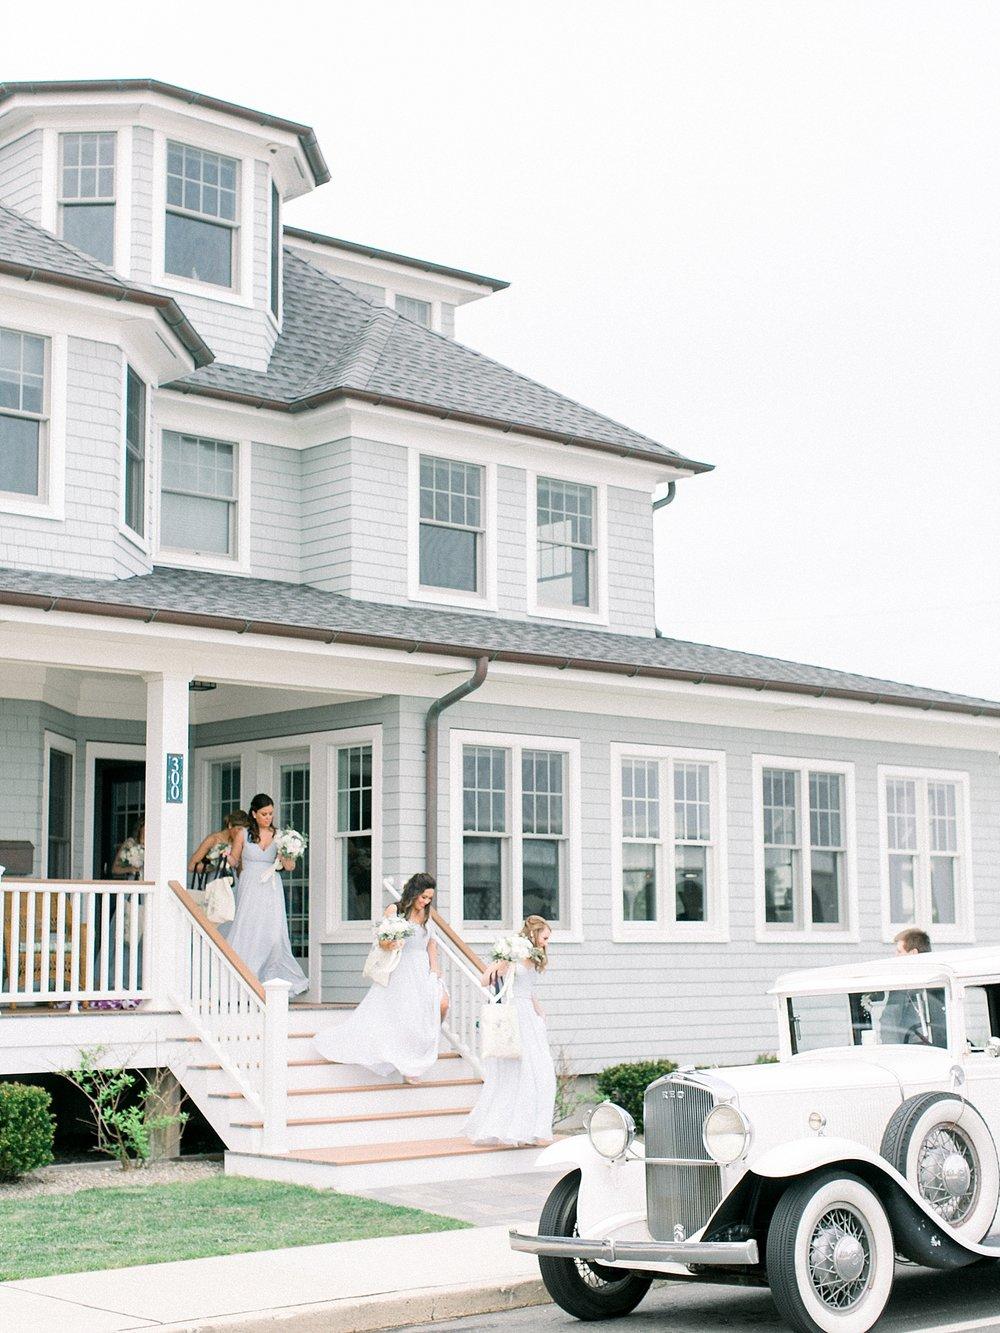 clarks_landing_nj_wedding_photography_0028.jpg